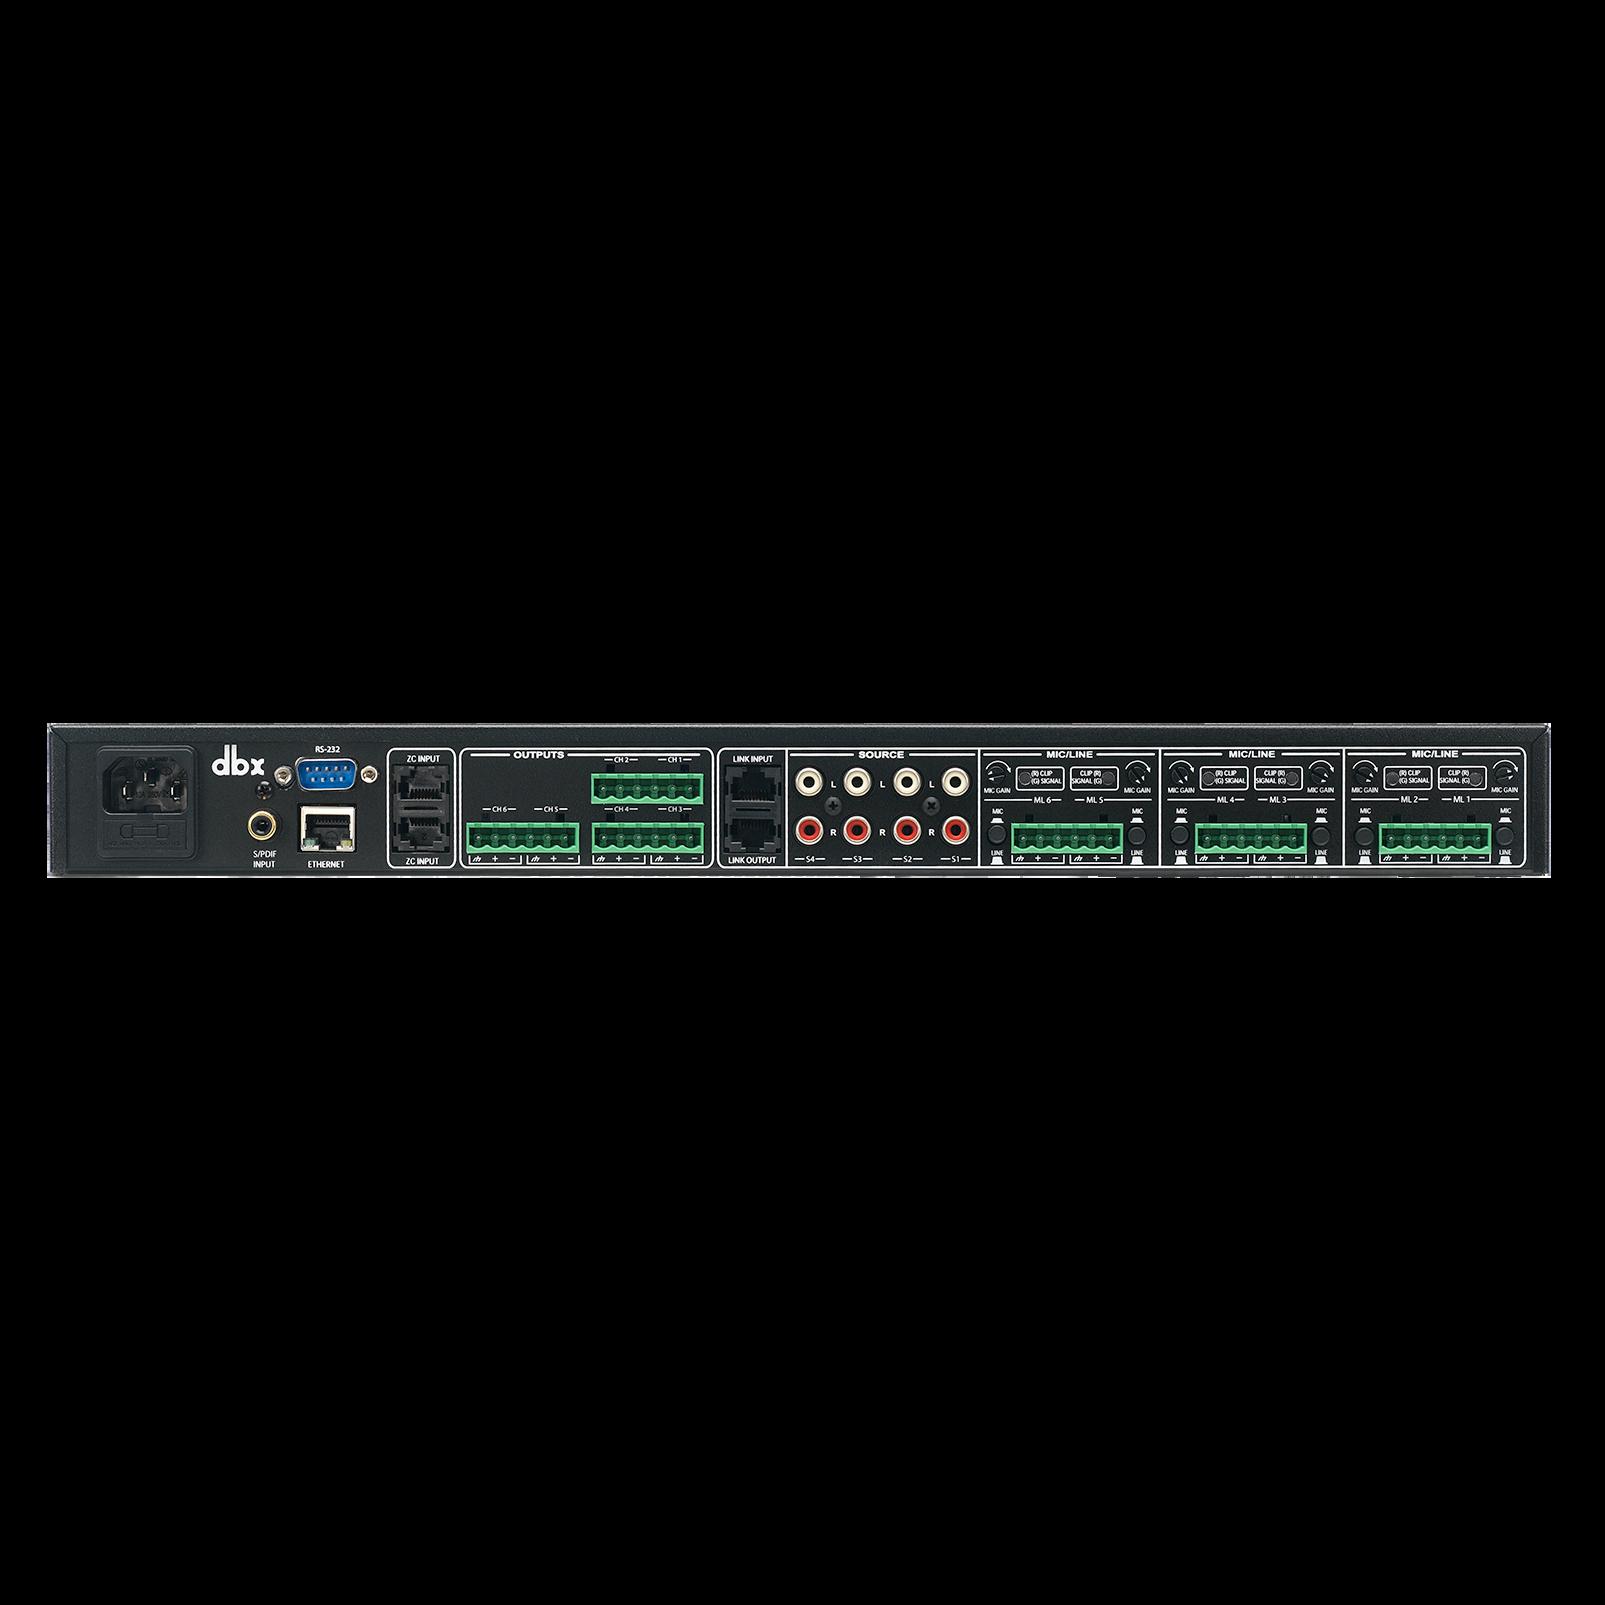 ZonePro 1261m - Black - 12x6 Digital Zone Processor - Back